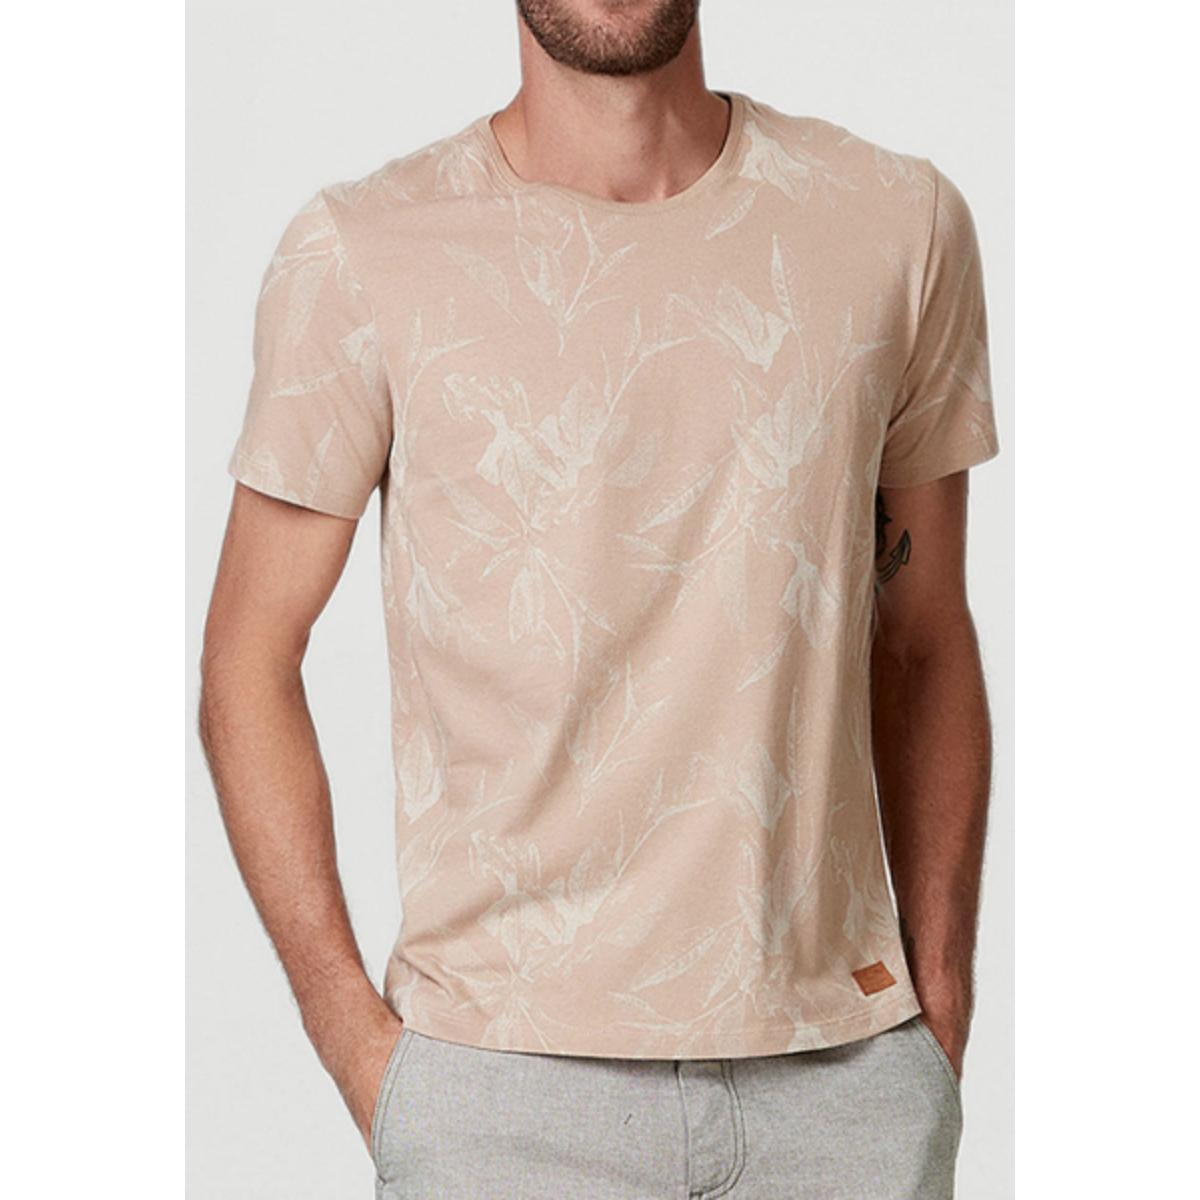 Camiseta Masculina Hering 4efk 3jen Bege Estampado